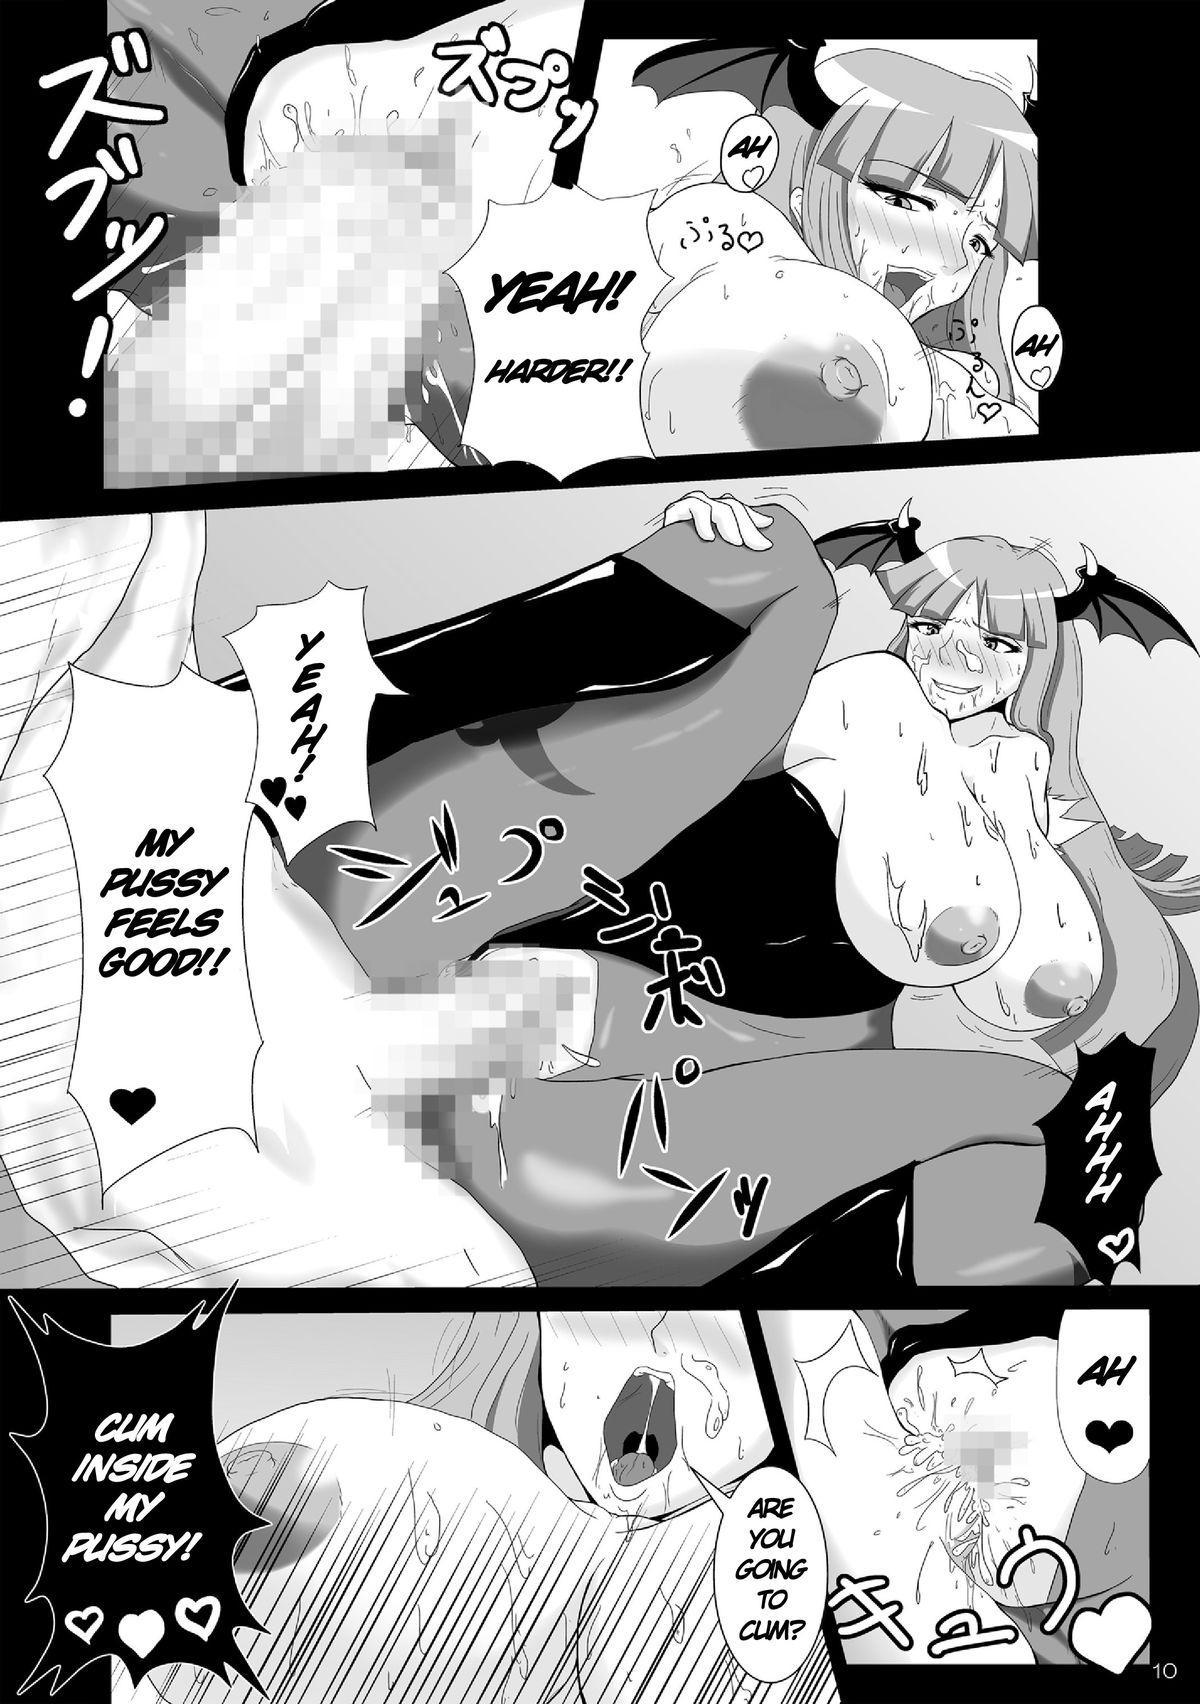 Saigo no Itteki made Shiborasete Morrigan no Sukebe Sugiru Jittai | Milking It Until The Last Drop the Perverted Side of Morrigan 9